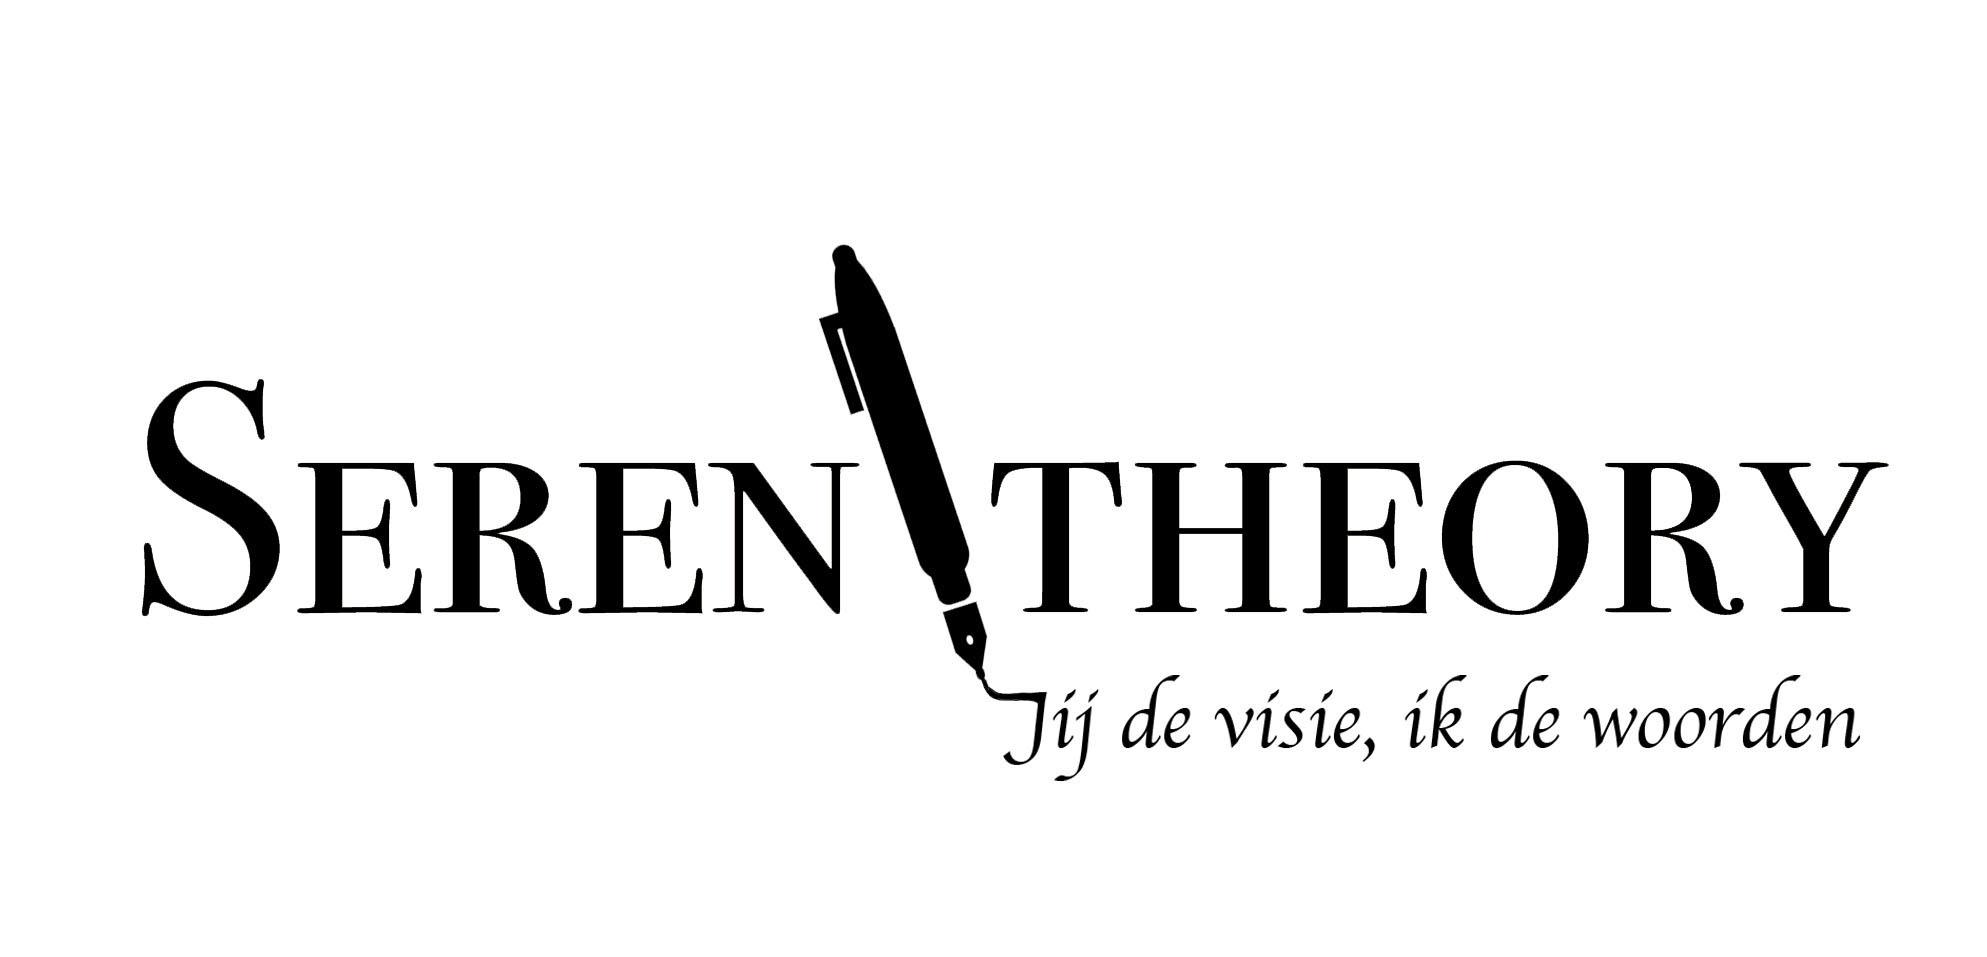 Serenitheory